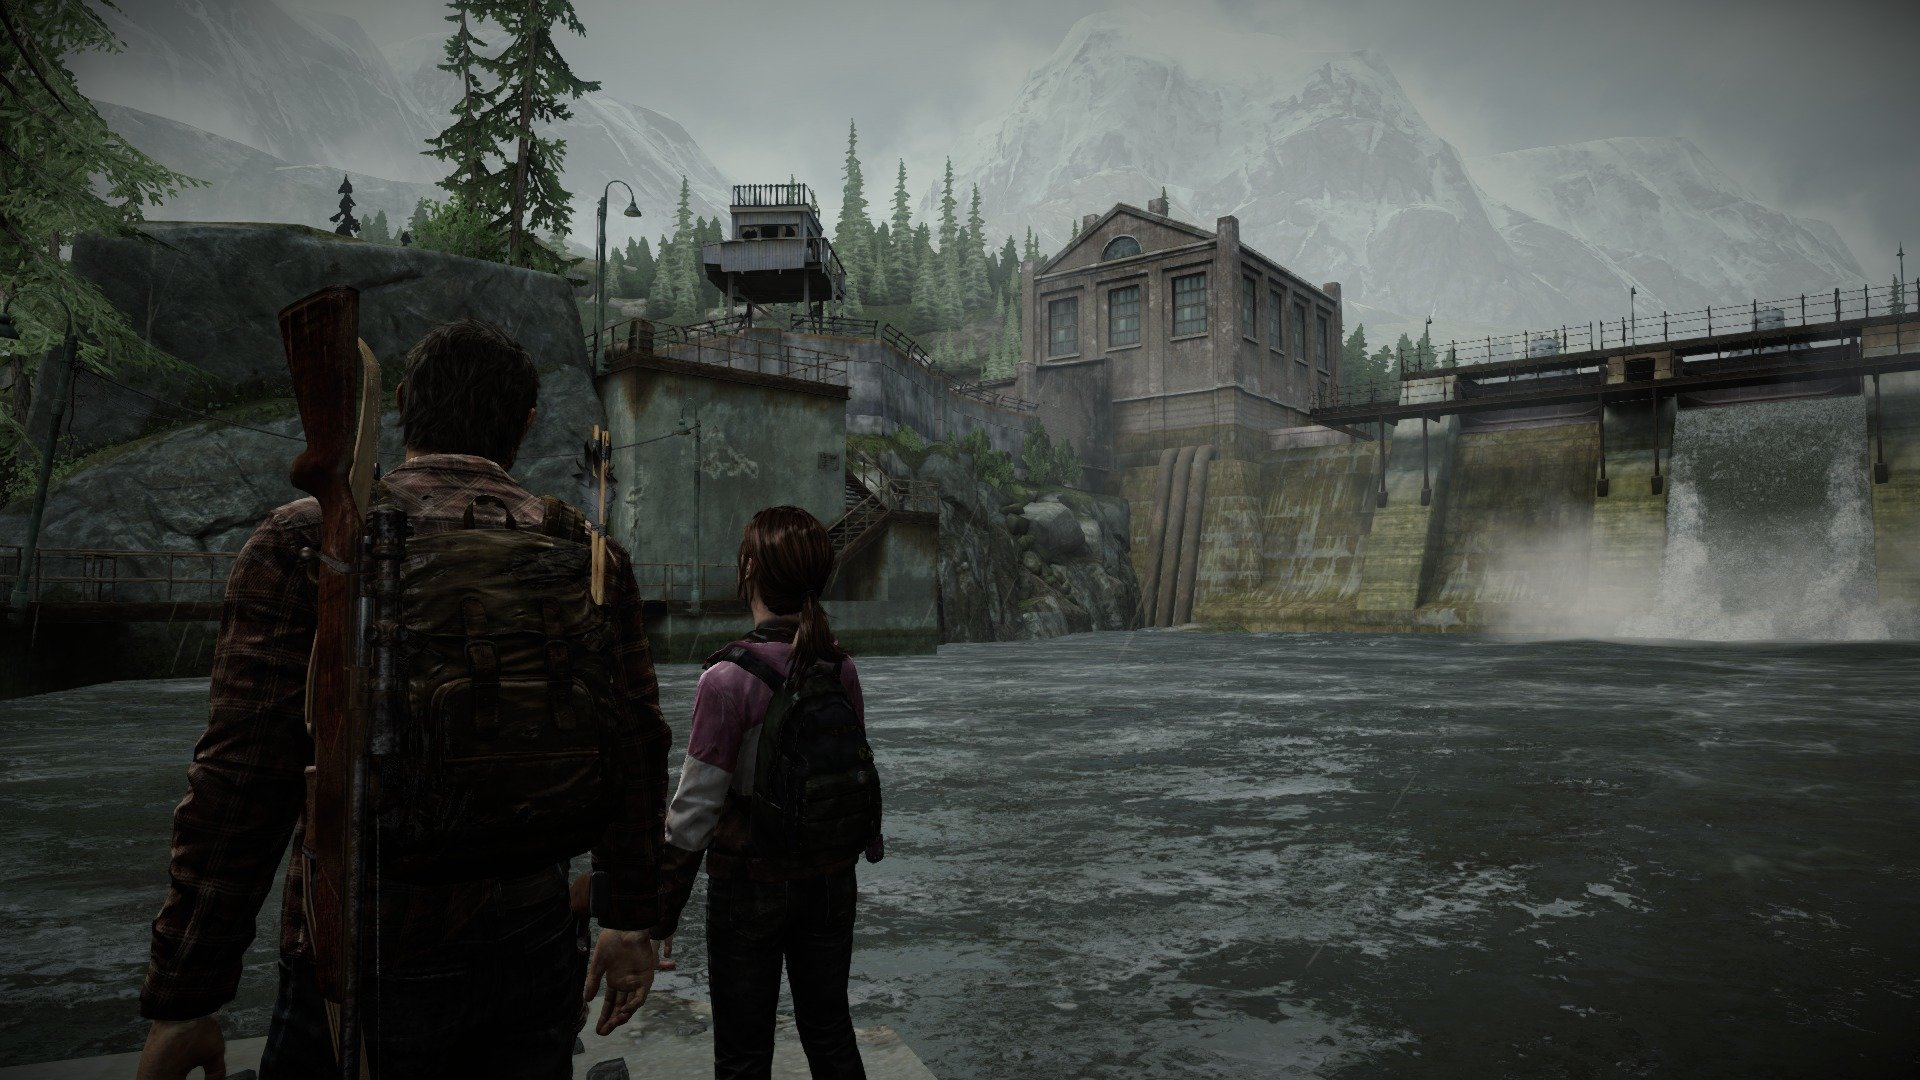 Download Full Hd 1080p The Last Of Us Desktop Wallpaper Id 248132